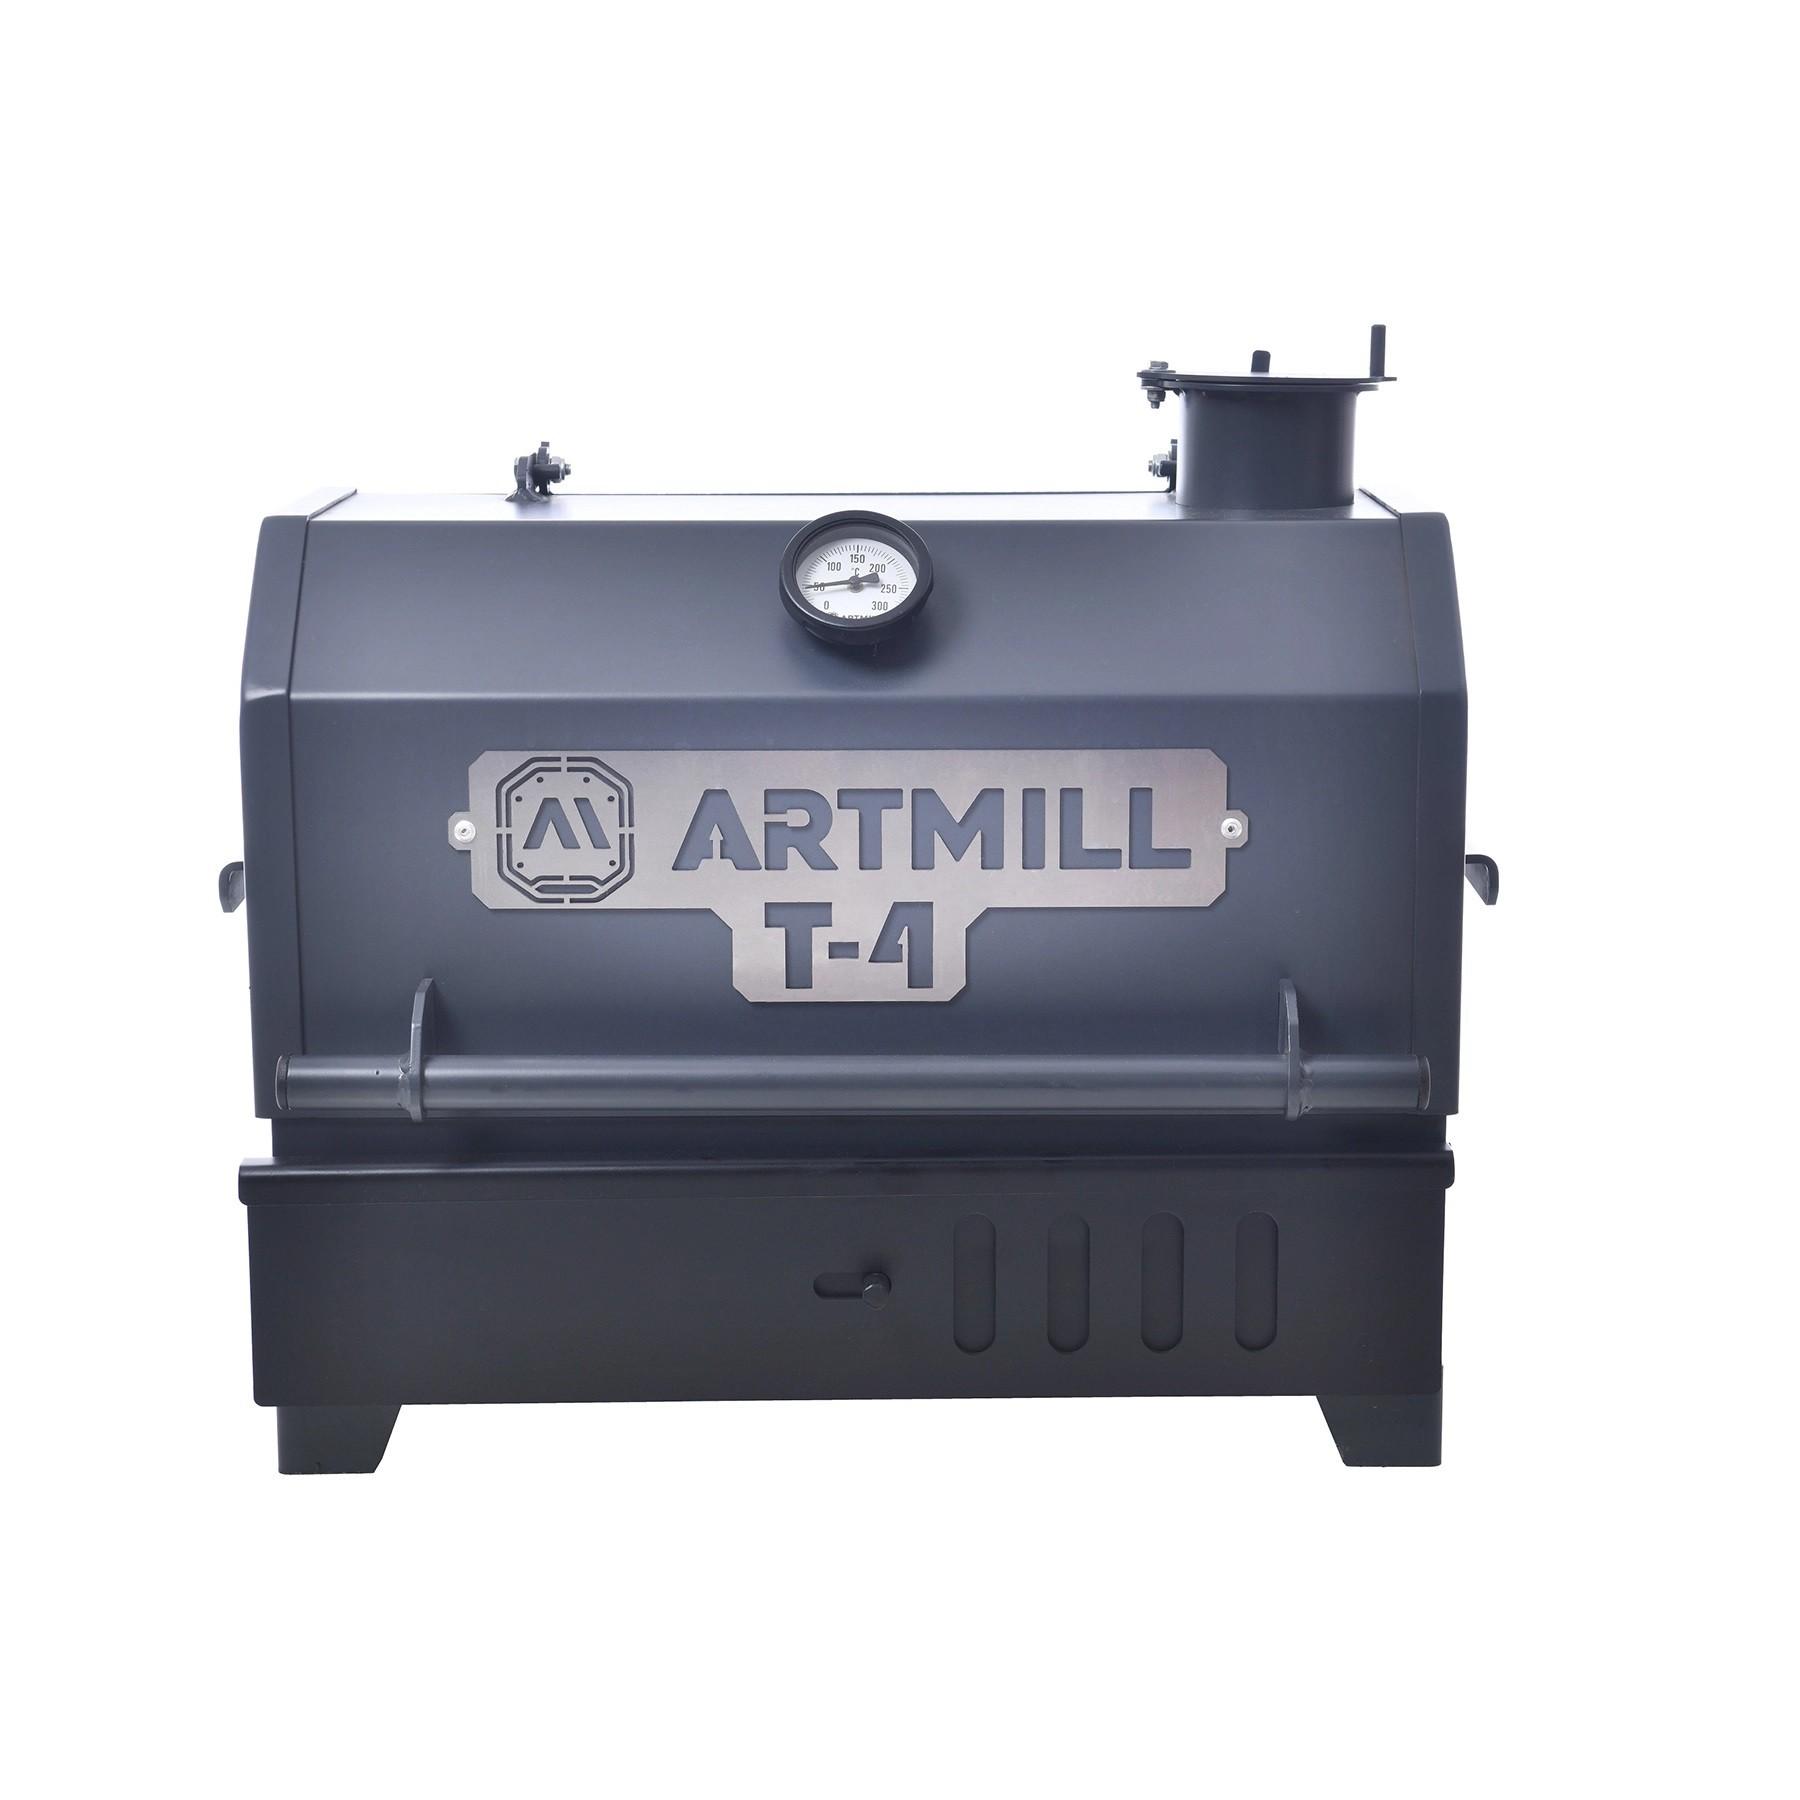 Defumador Smoker Table Pit T4 Artmill